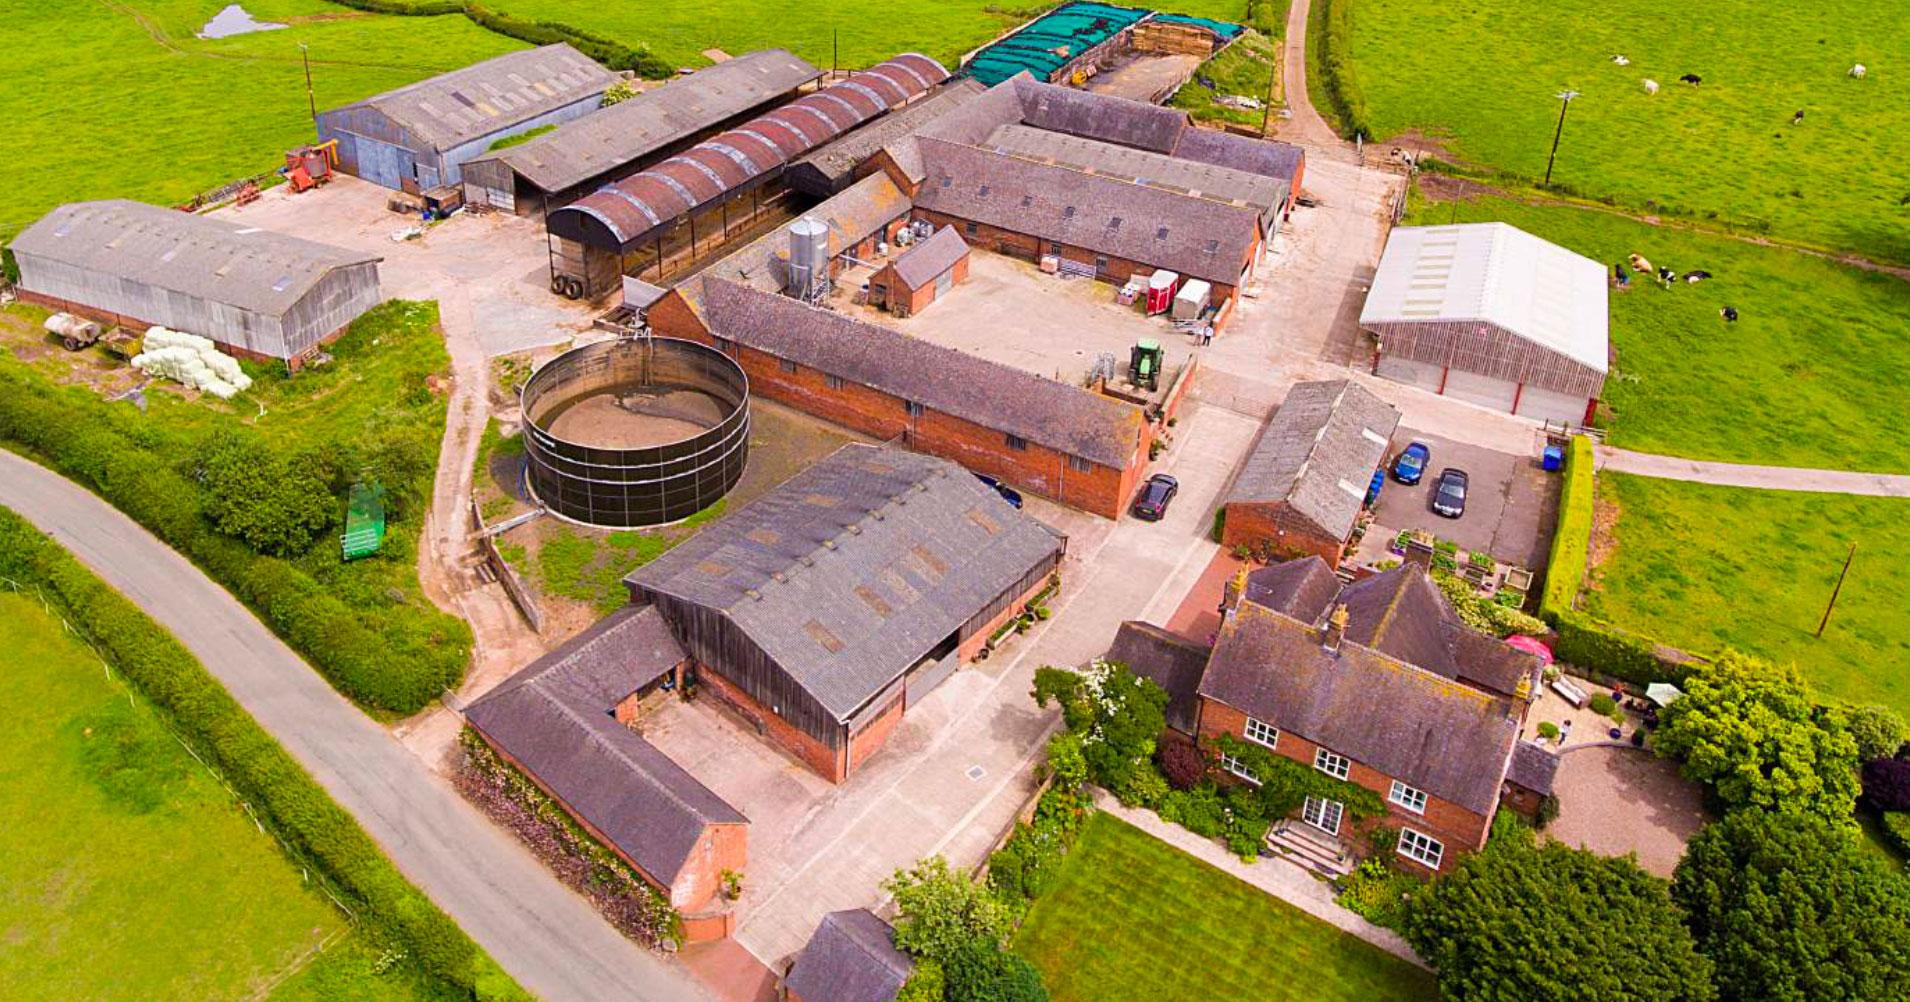 Picturesque 283-acre Shropshire farm listed for sale